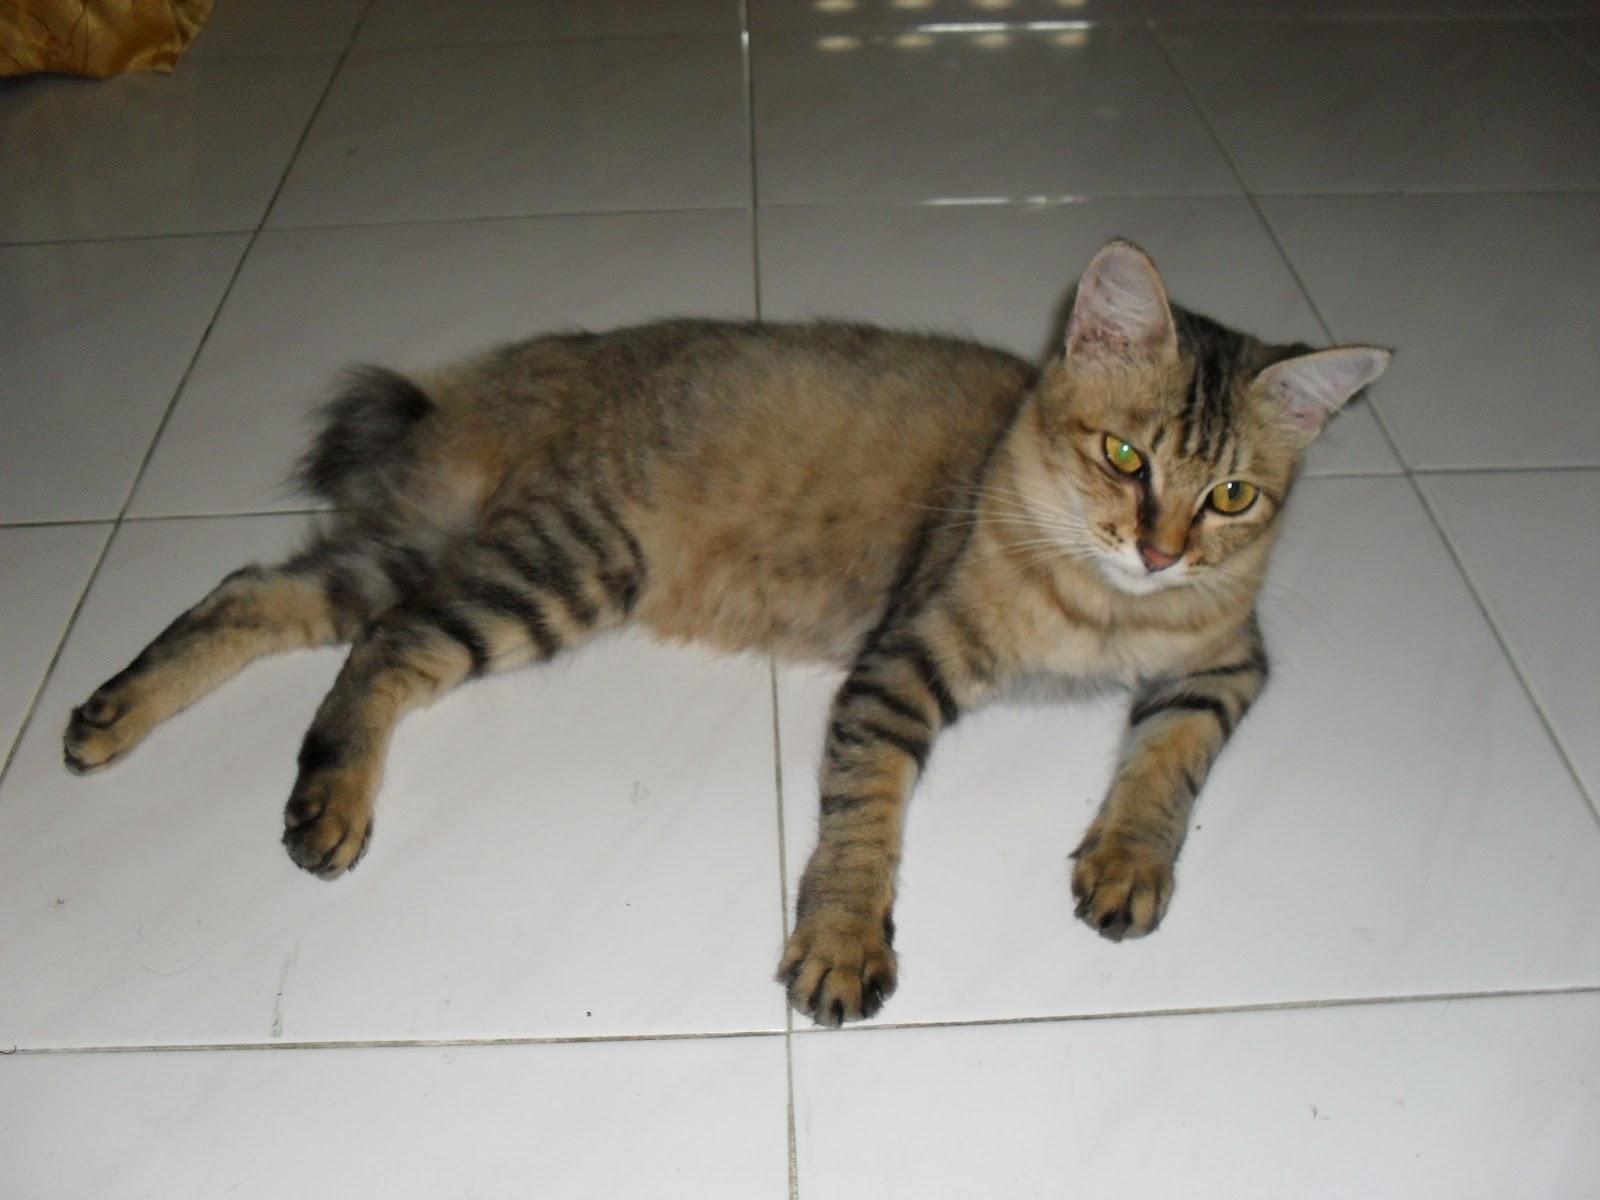 Kucing Paling Besar Di Dunia Vs Kucing Saya Mana Lagi